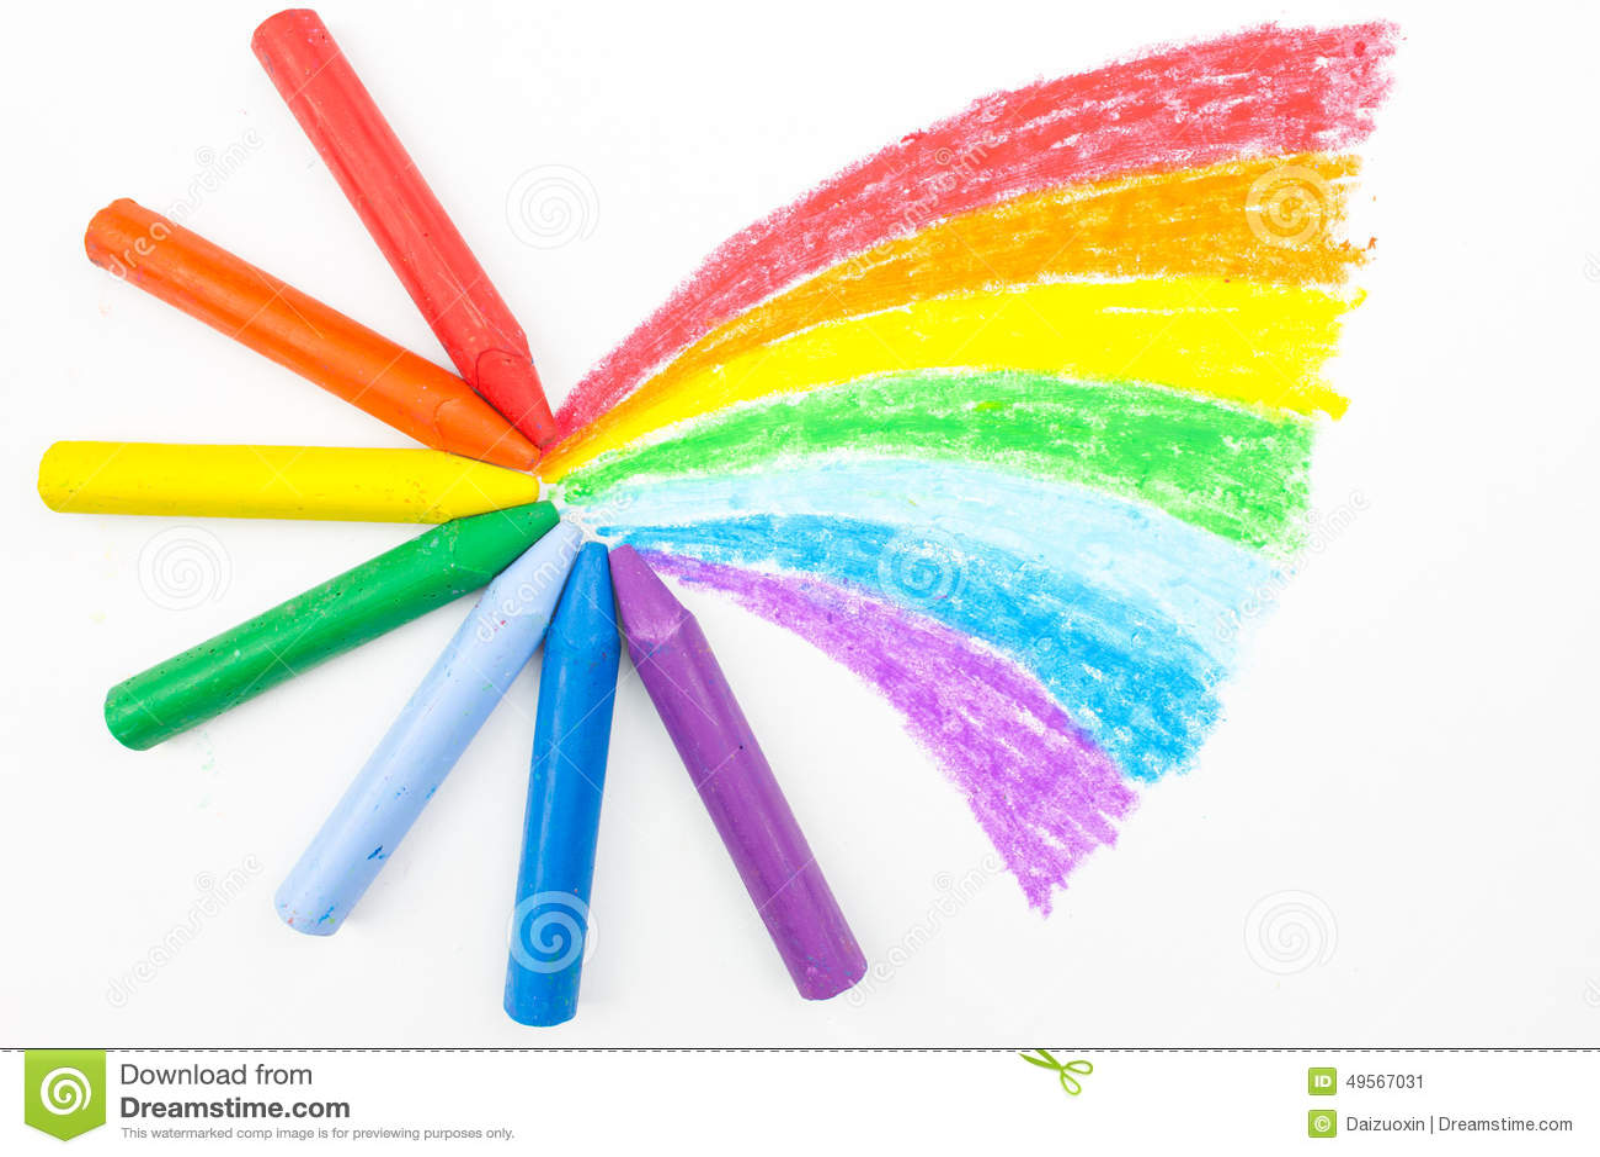 child s rainbow crayon drawing stock image image of children